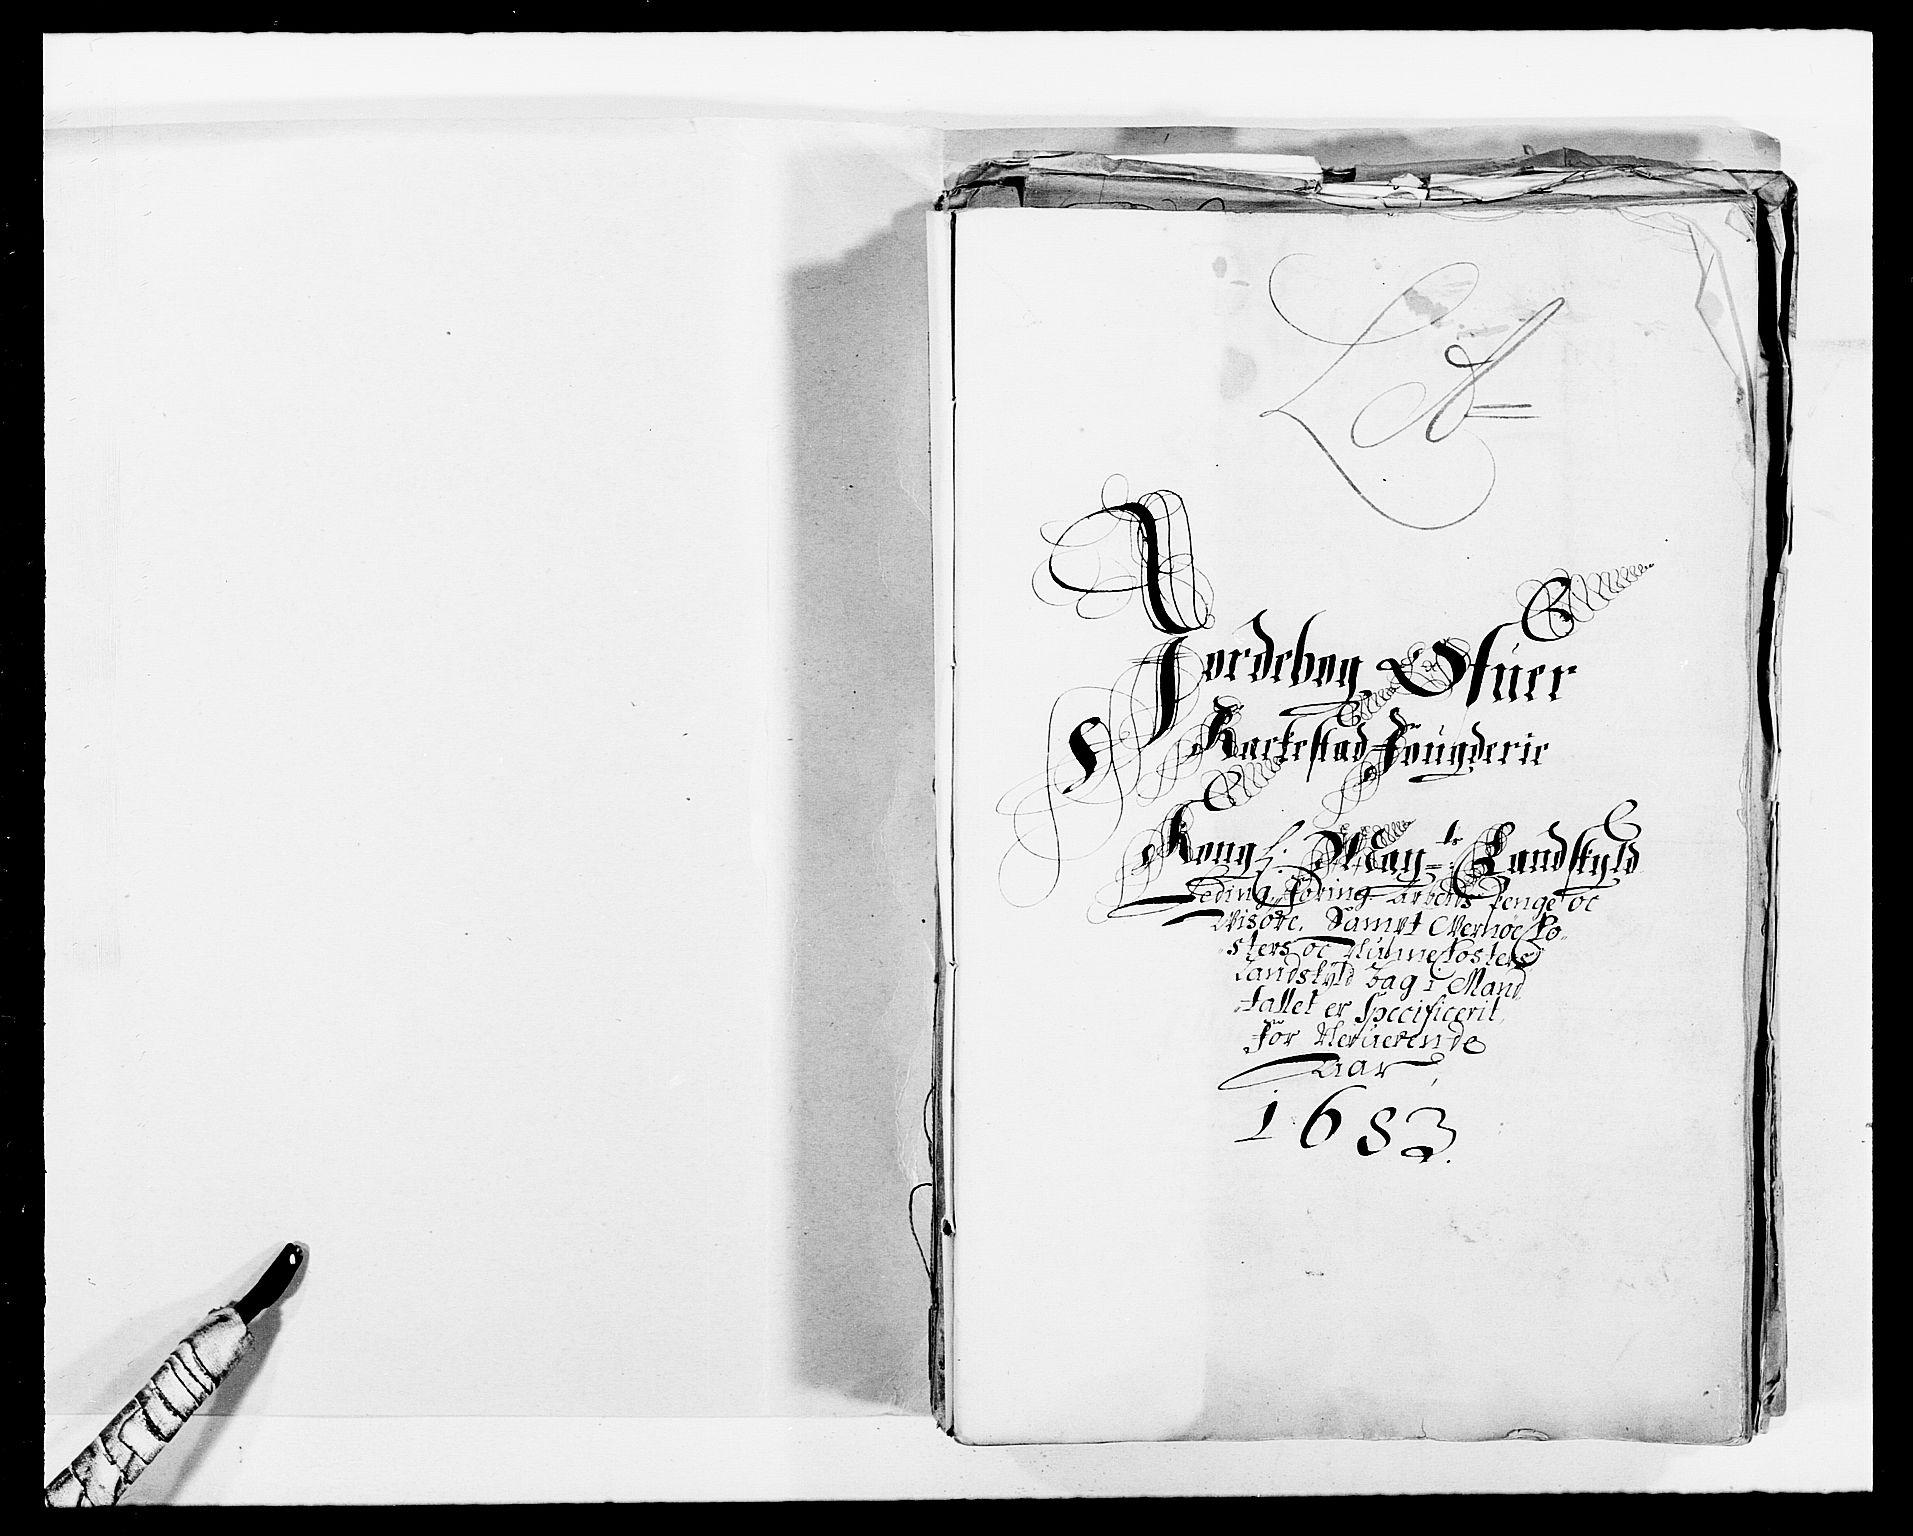 RA, Rentekammeret inntil 1814, Reviderte regnskaper, Fogderegnskap, R05/L0274: Fogderegnskap Rakkestad, 1683-1684, s. 2